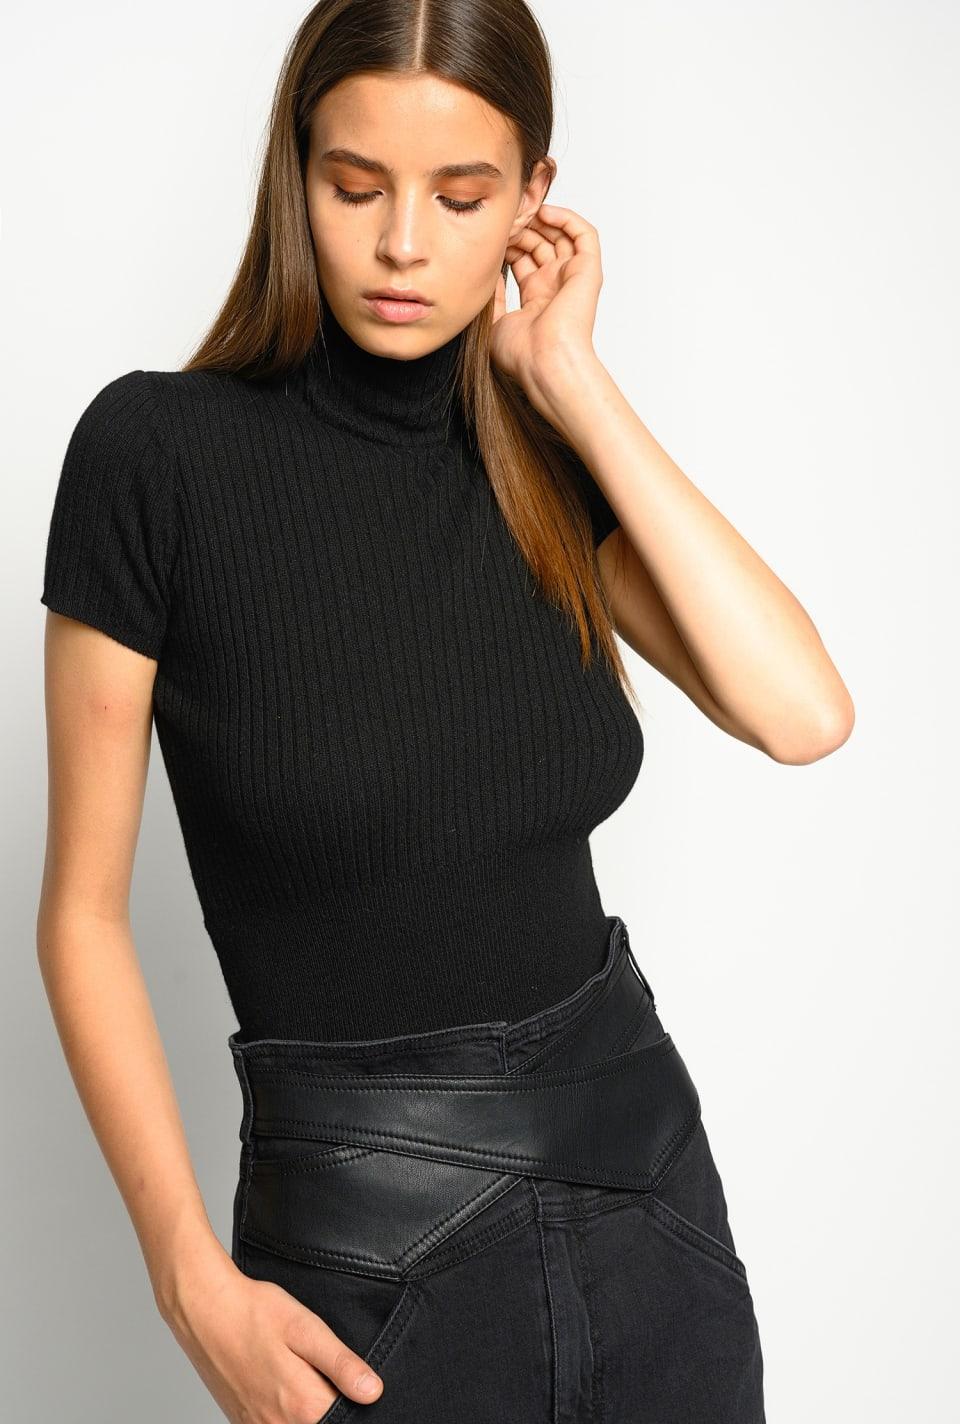 Cashmere-blend top